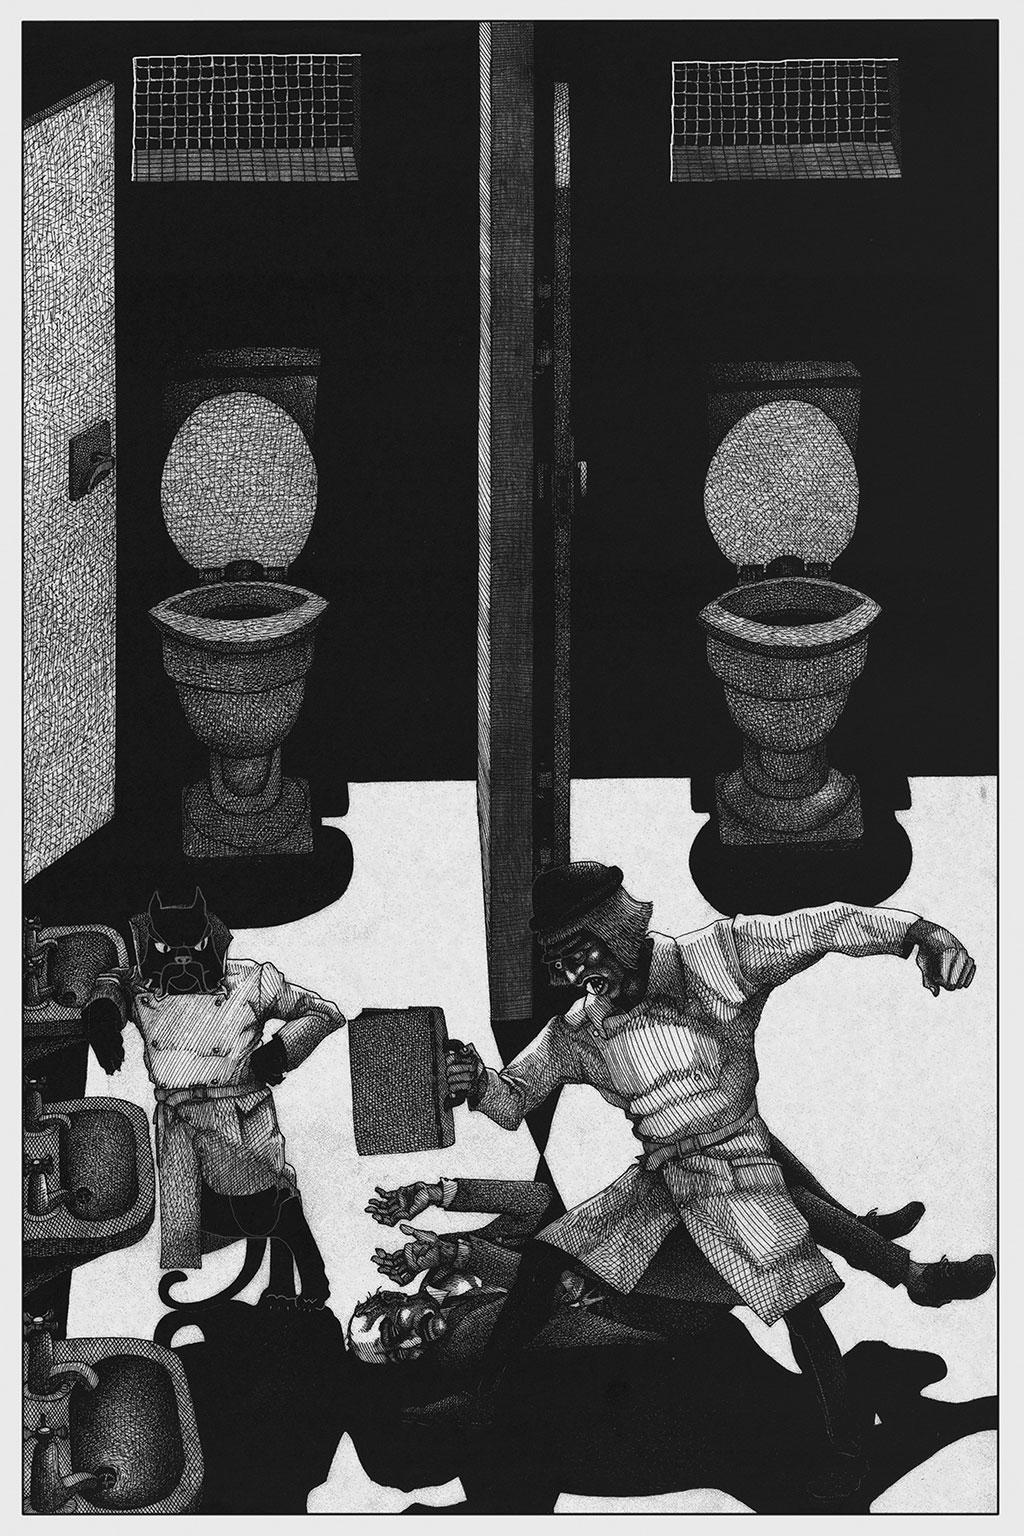 Иллюстрация Мастер и Маргарита Чарли Стоун 6